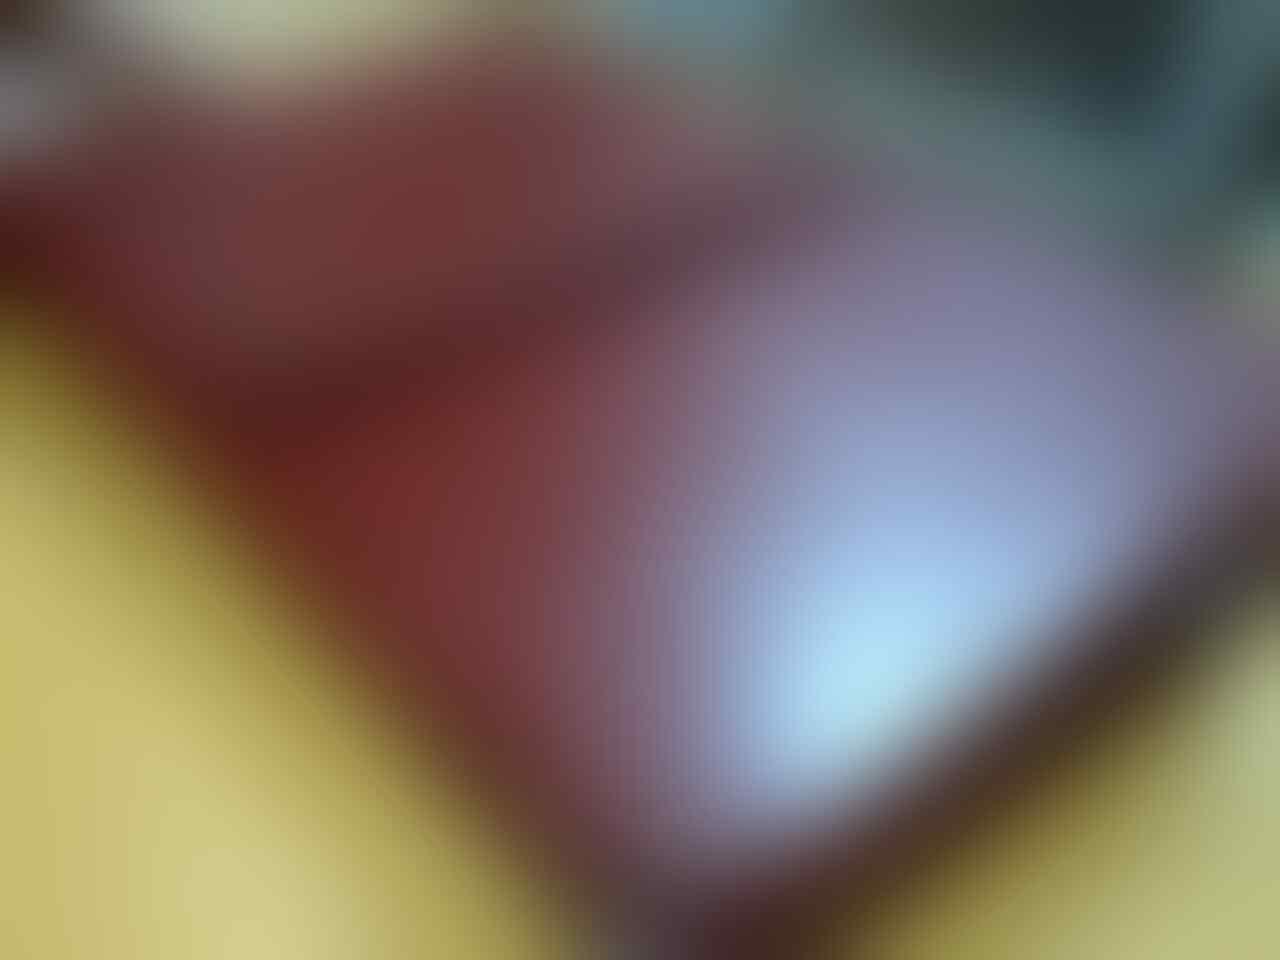 SAMSUNG GALAXY TAB P1000, FULLPACK EDITION, LENGKAP DAN MULUS